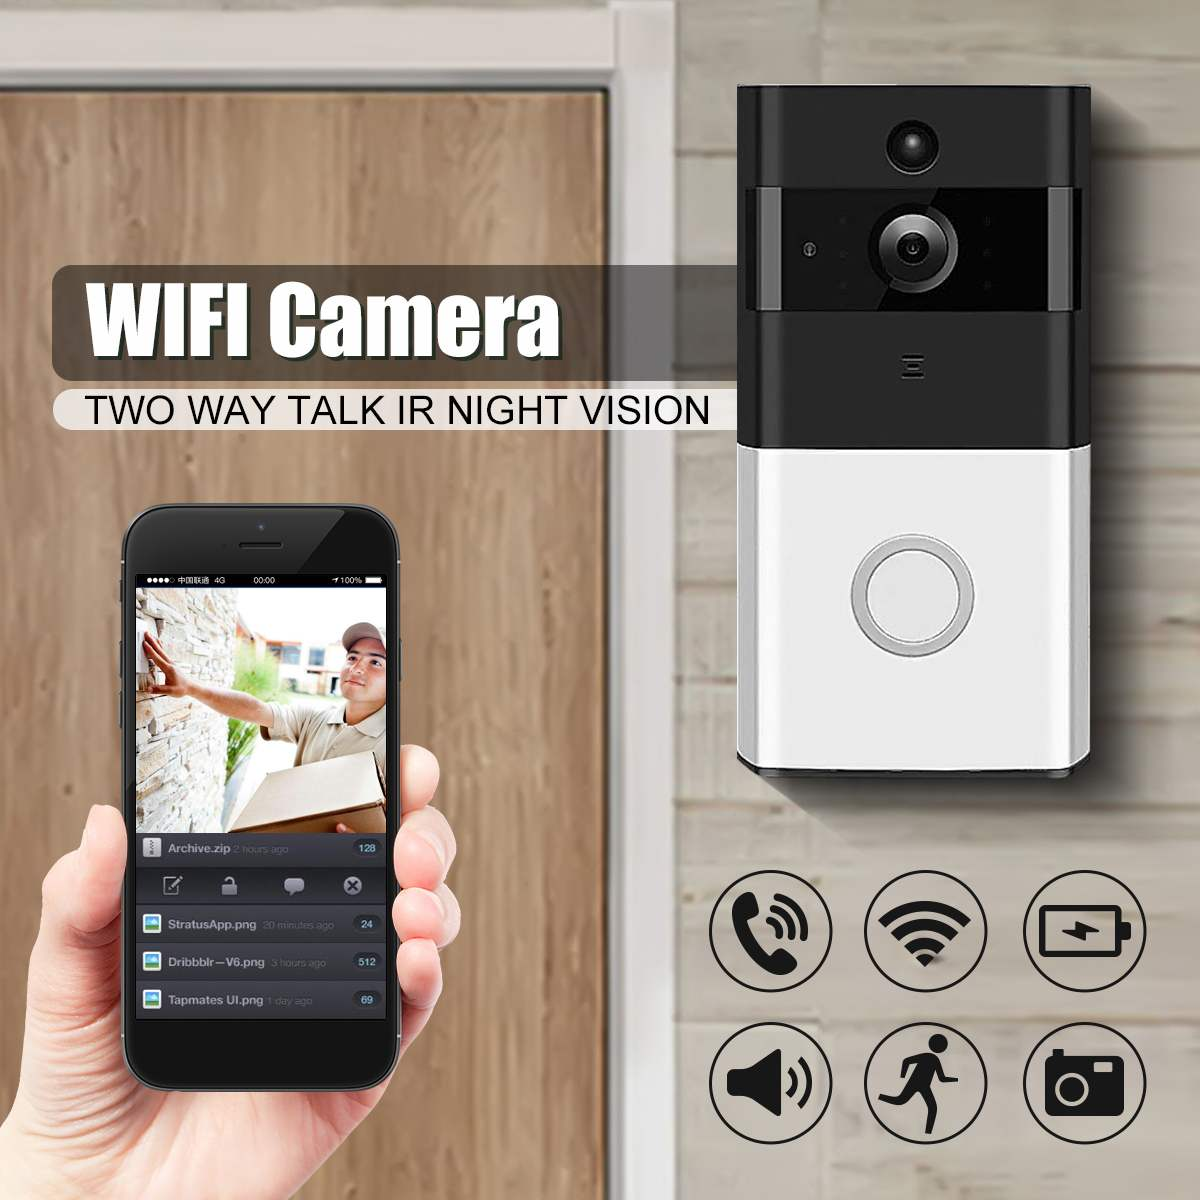 wireless doorbell peephole camera wifi video doorbell receiver set audio with speaker night. Black Bedroom Furniture Sets. Home Design Ideas